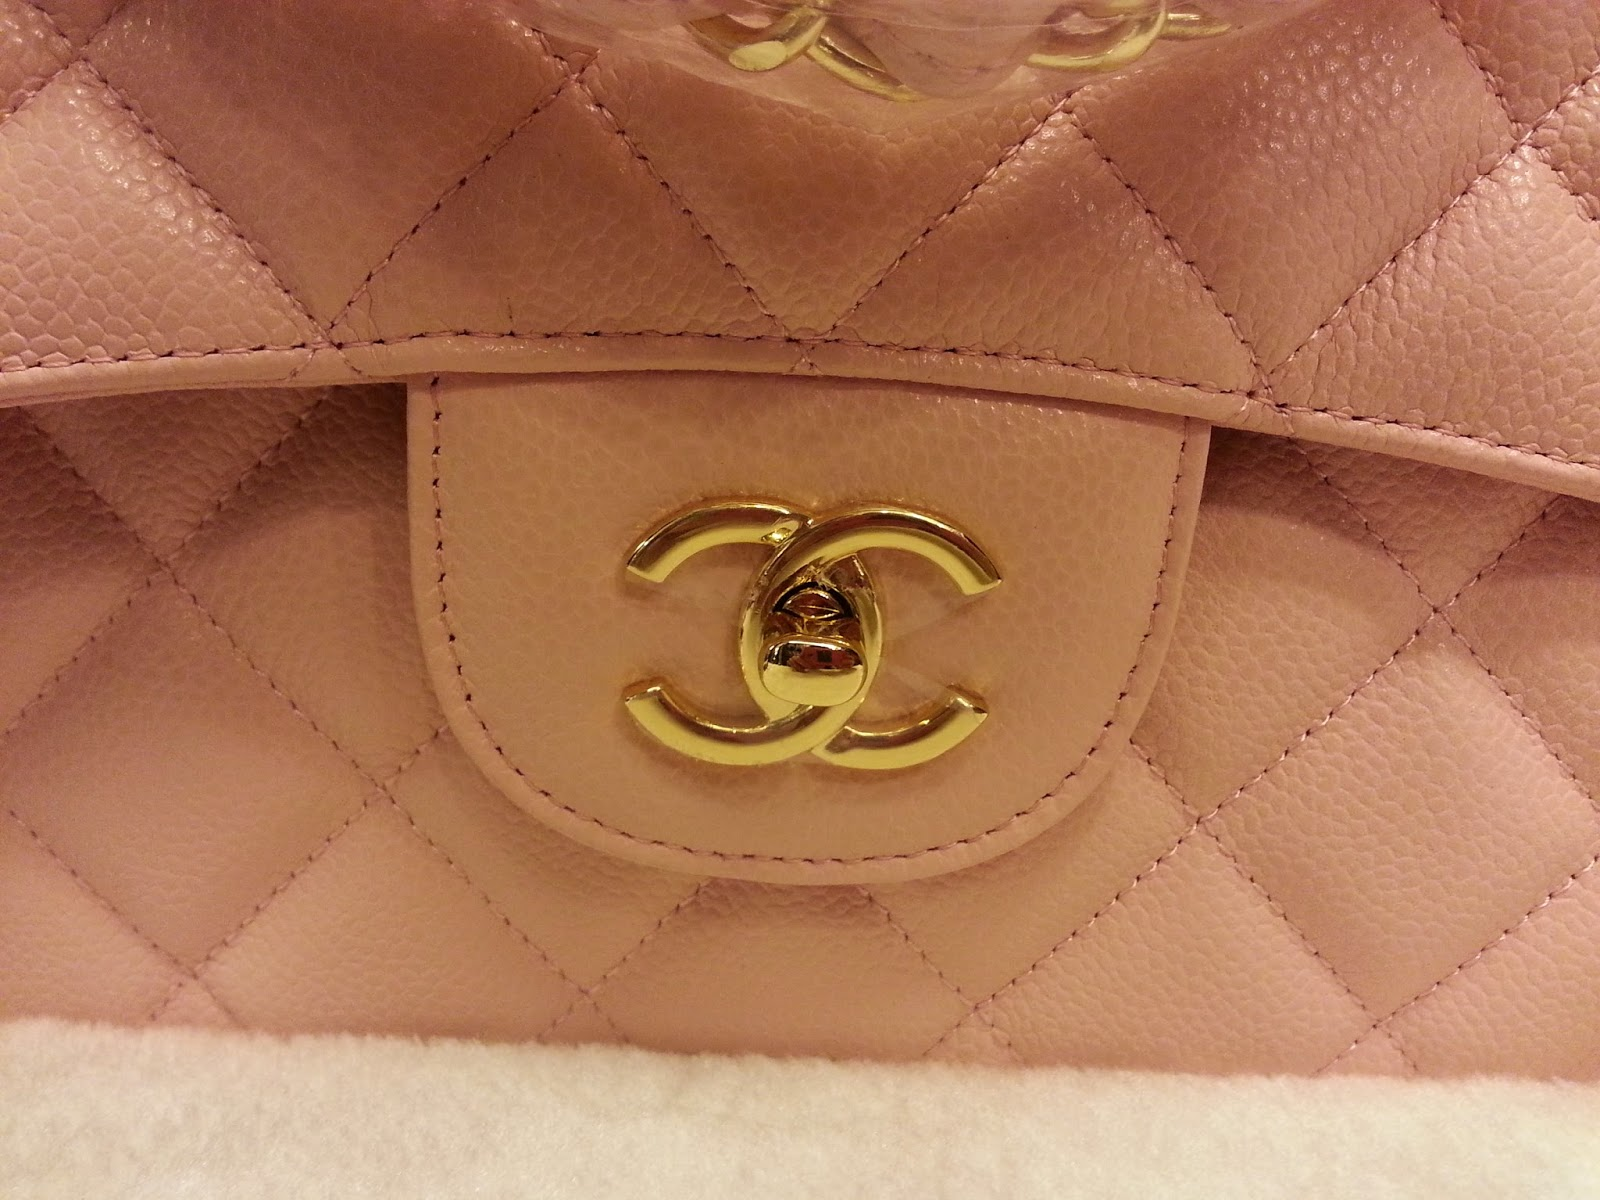 8d7802368e7b Deal Treasure: Chanel Classic Jumbo Pink Caviar Leather Double Flap ...